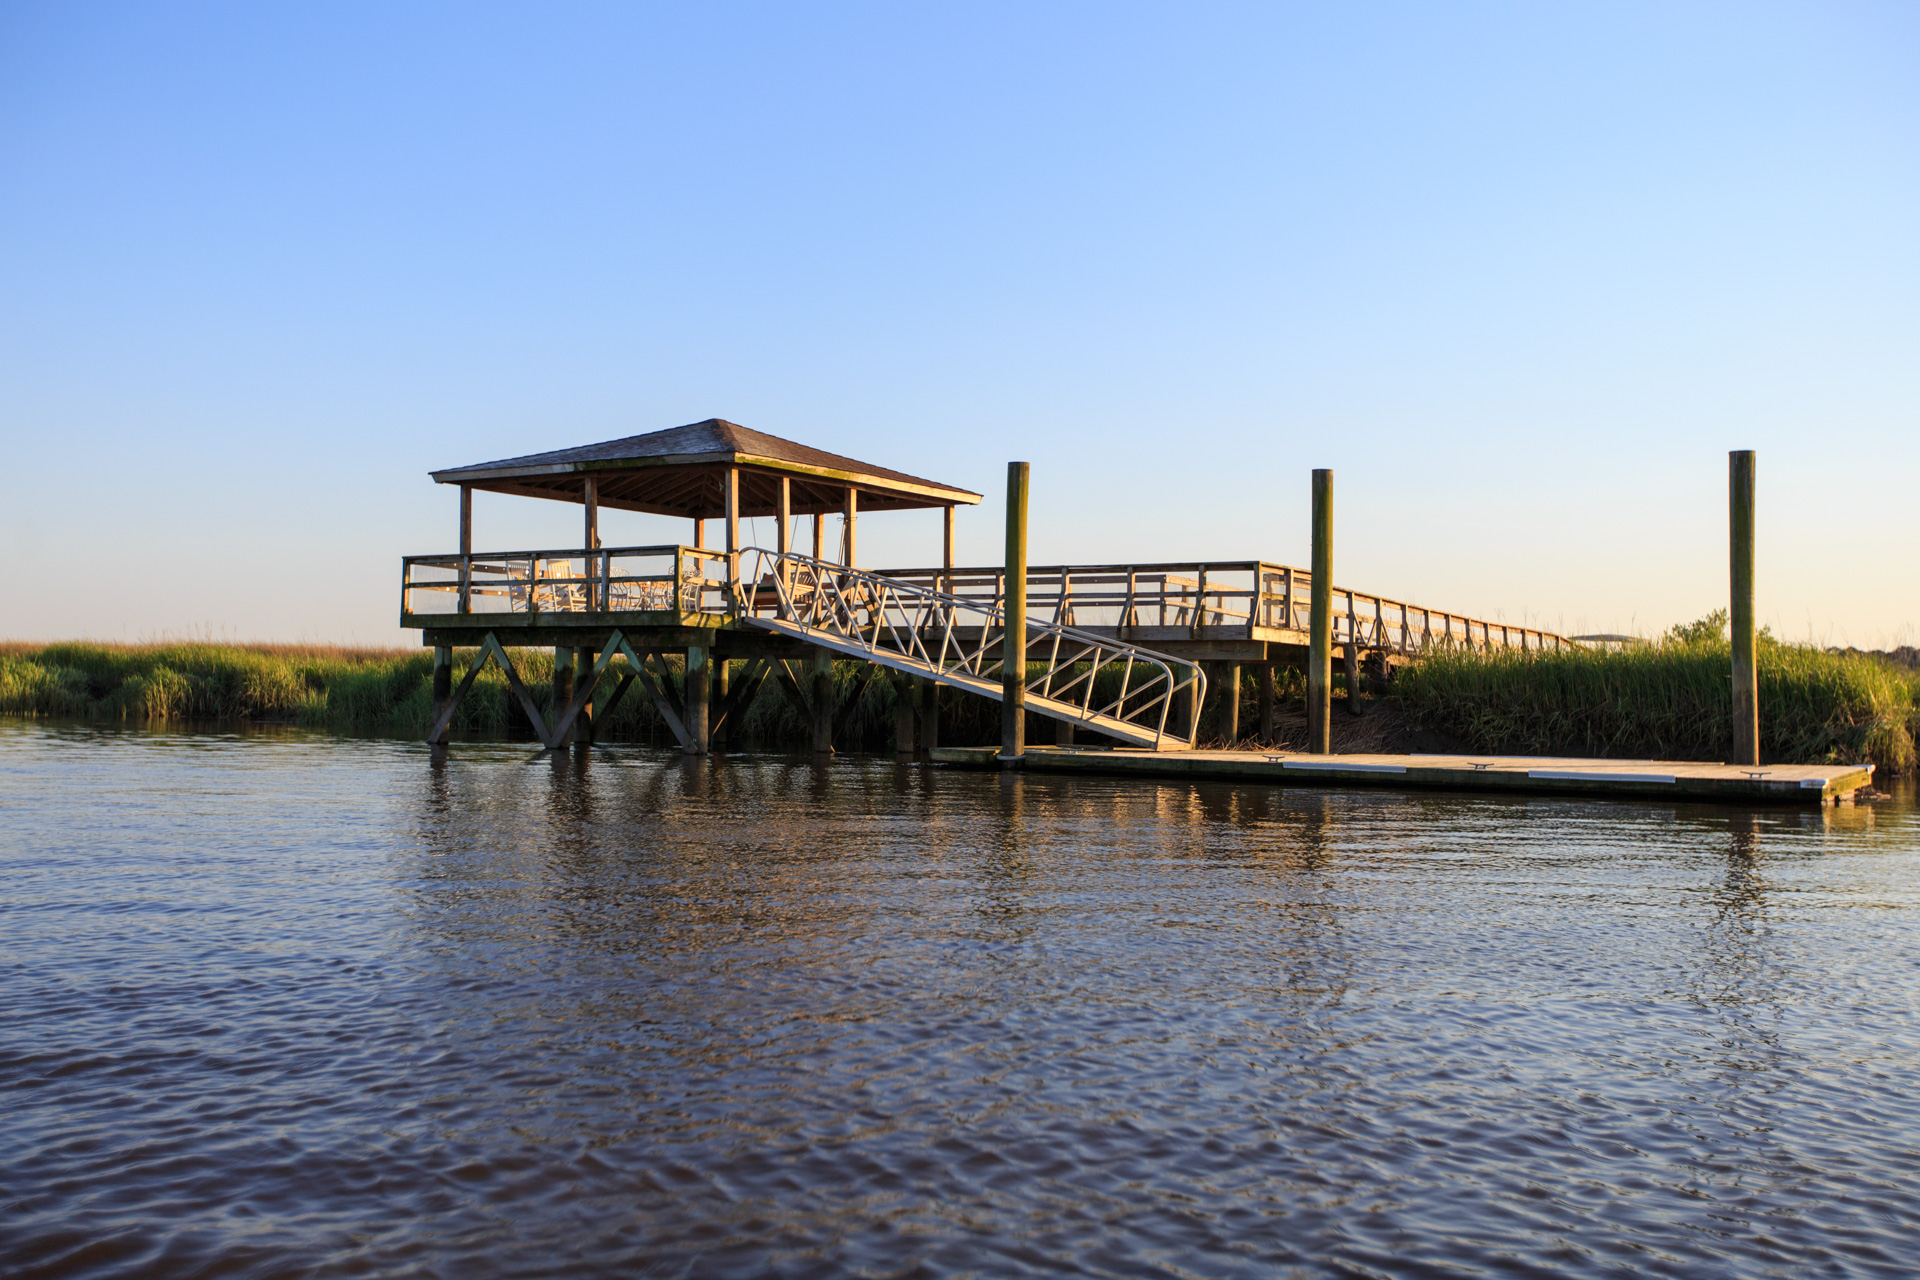 The Docks & Waterways